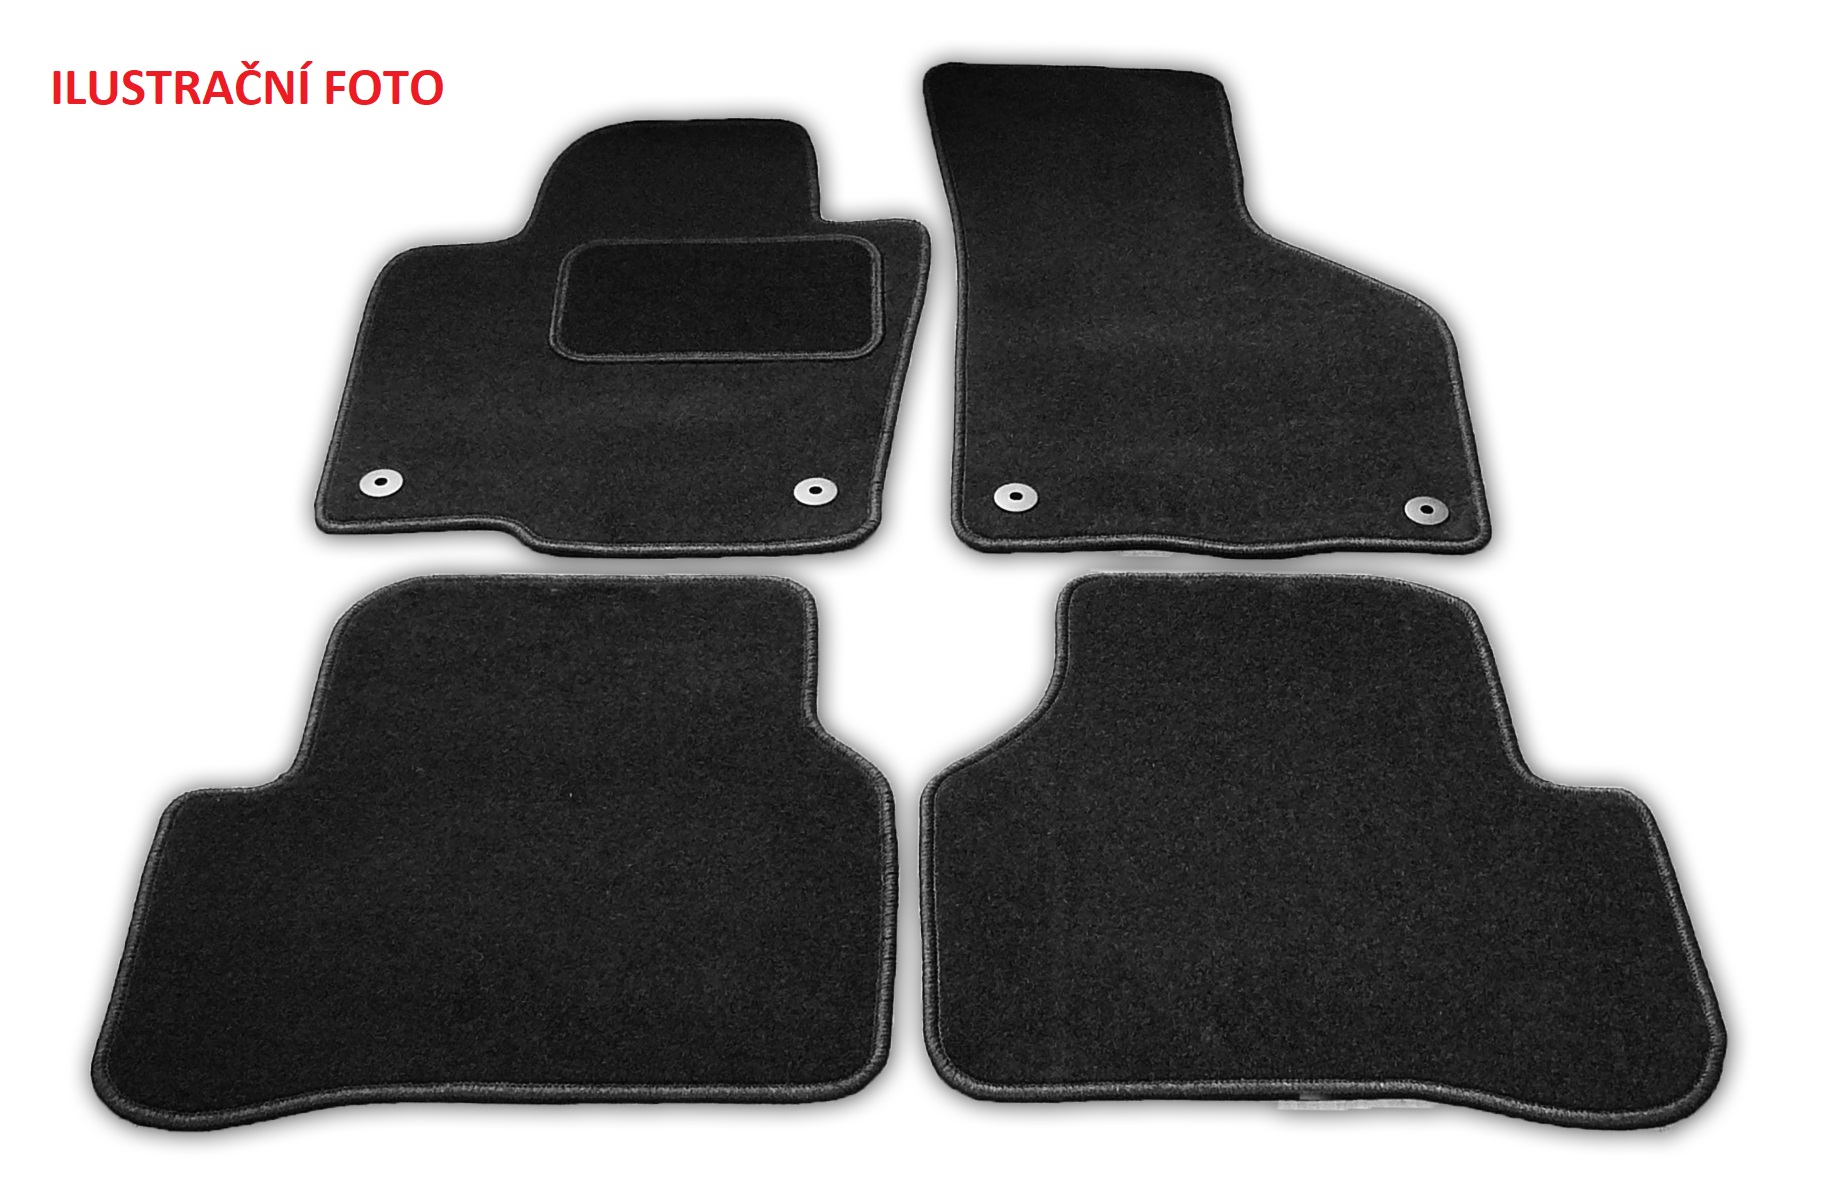 Automega Textilní autokoberce Standard Ford Fusion 2002-